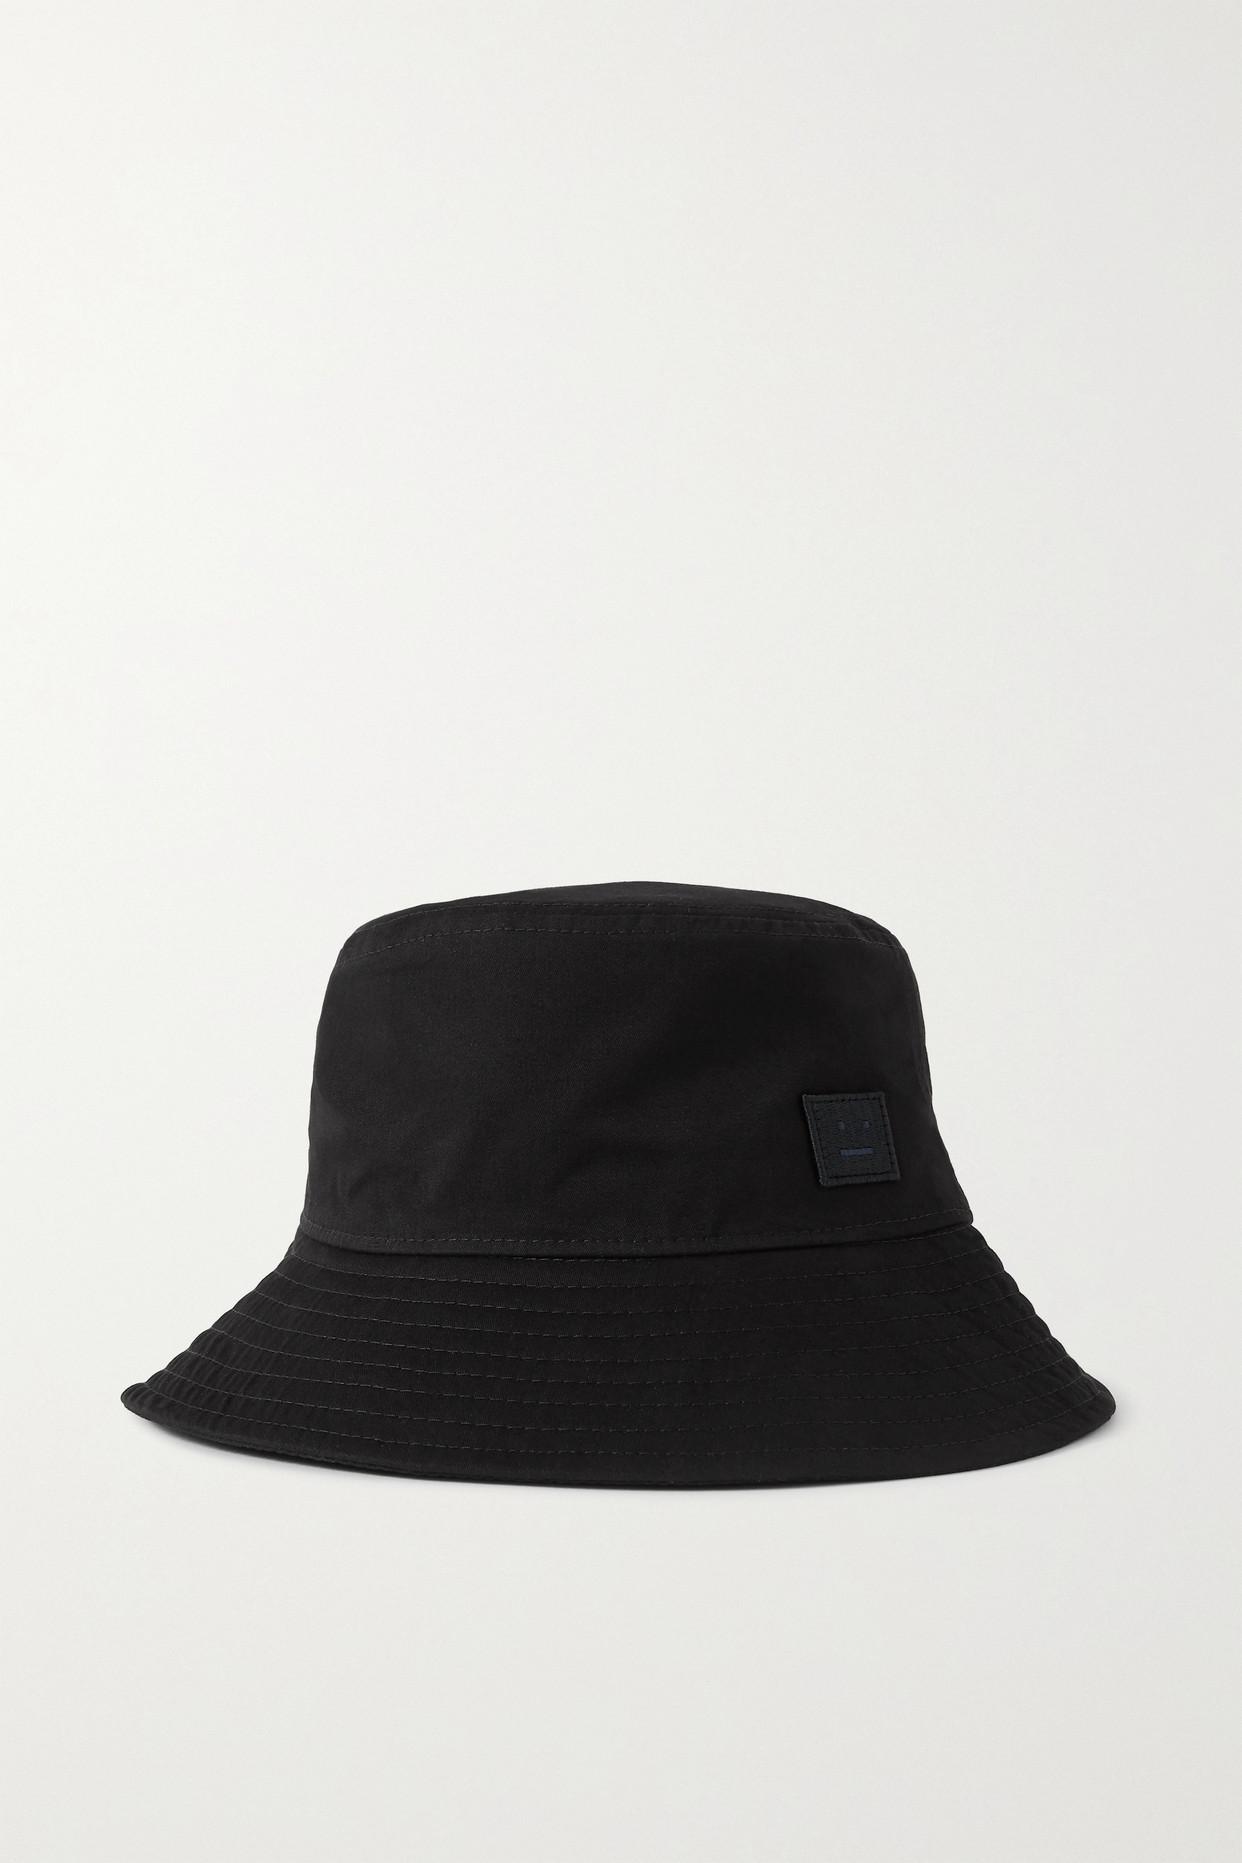 Acne Studios Appliquéd Cotton-twill Bucket Hat In Black